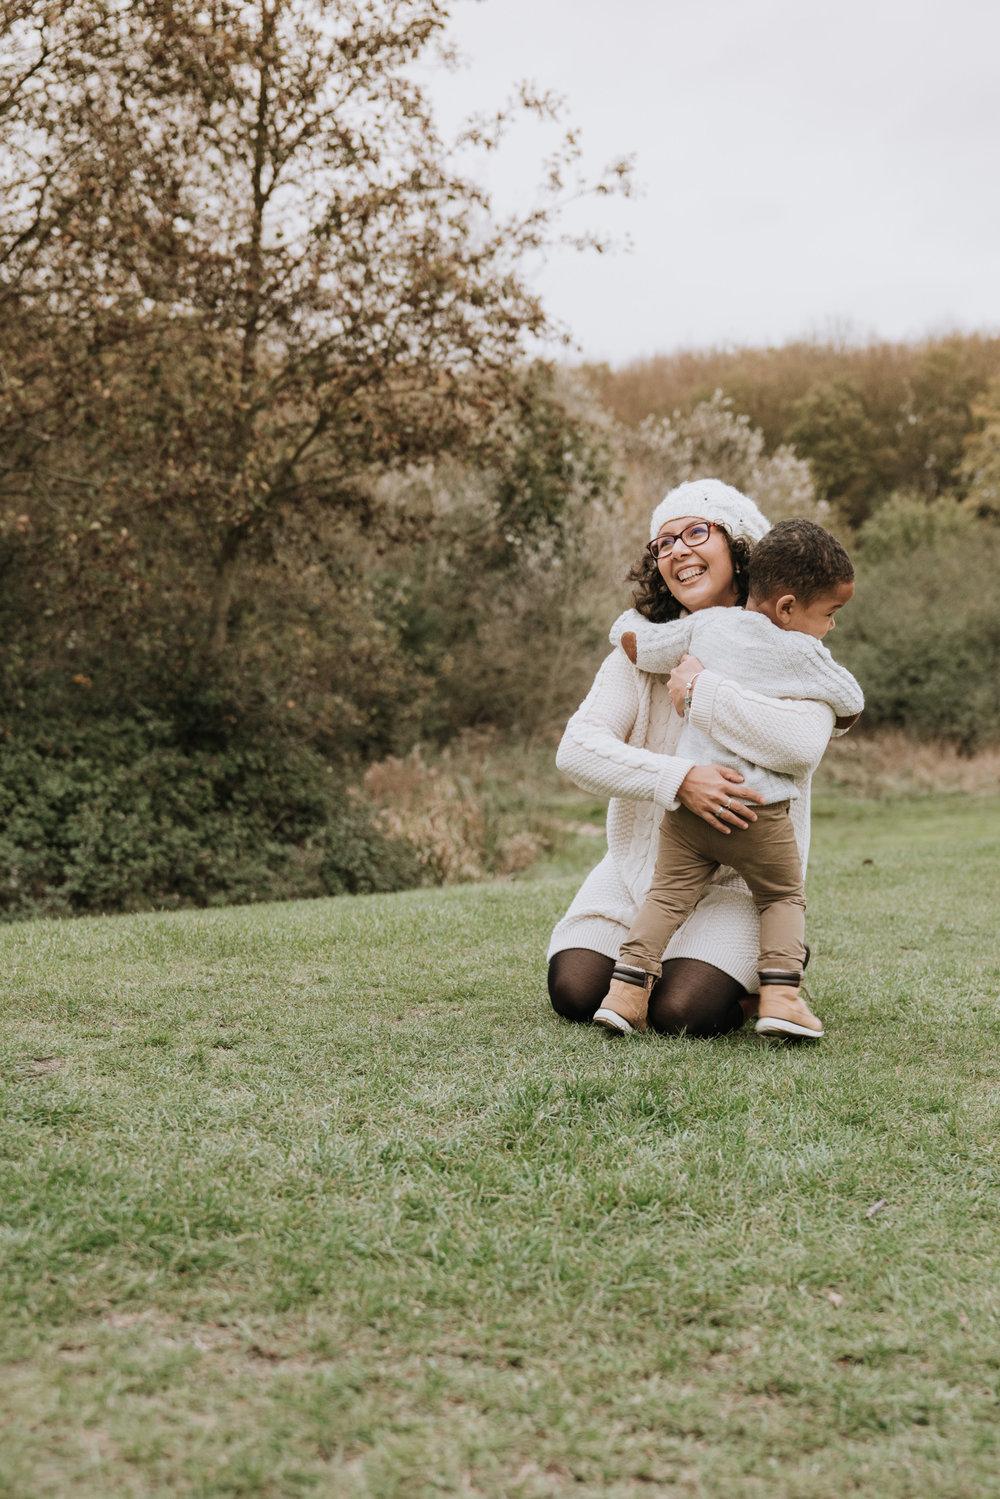 Grace-Elizabeth-Woodland-Family-Photography-Lifestyle-Essex-Norfolk-Suffolk-21.jpg